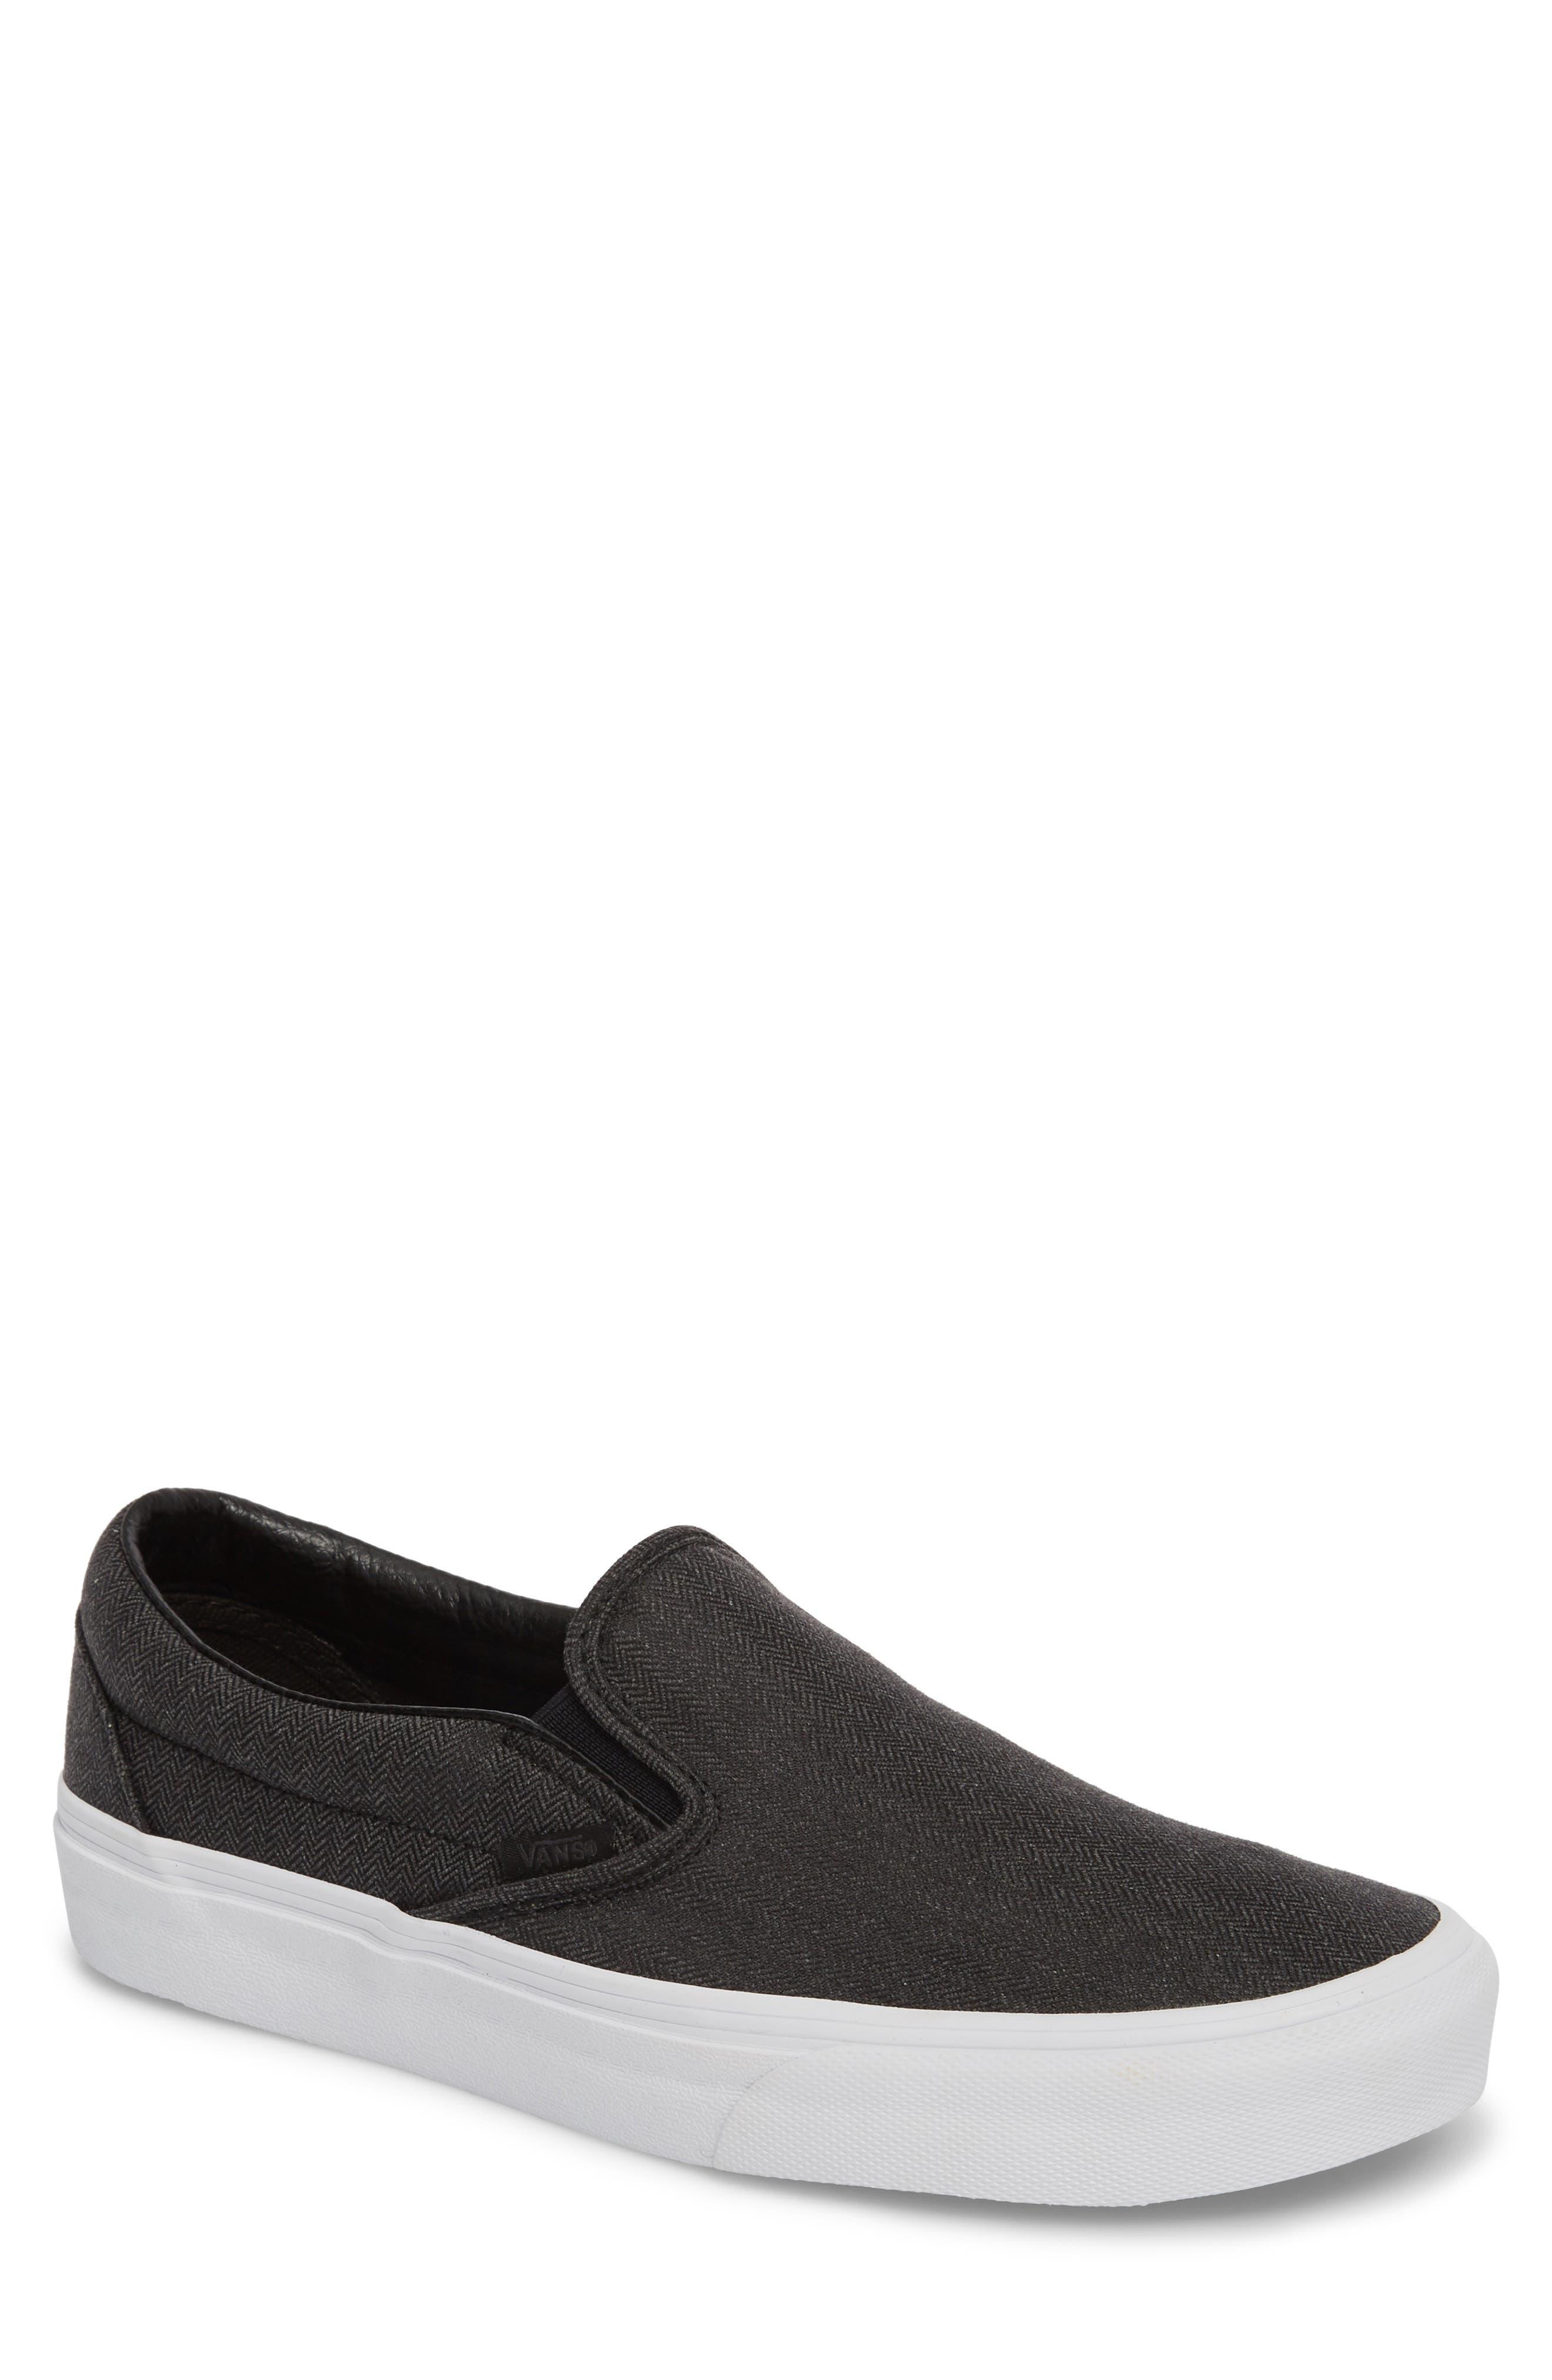 'Classic' Slip-On Sneaker,                             Main thumbnail 1, color,                             Black/ True White Fabric